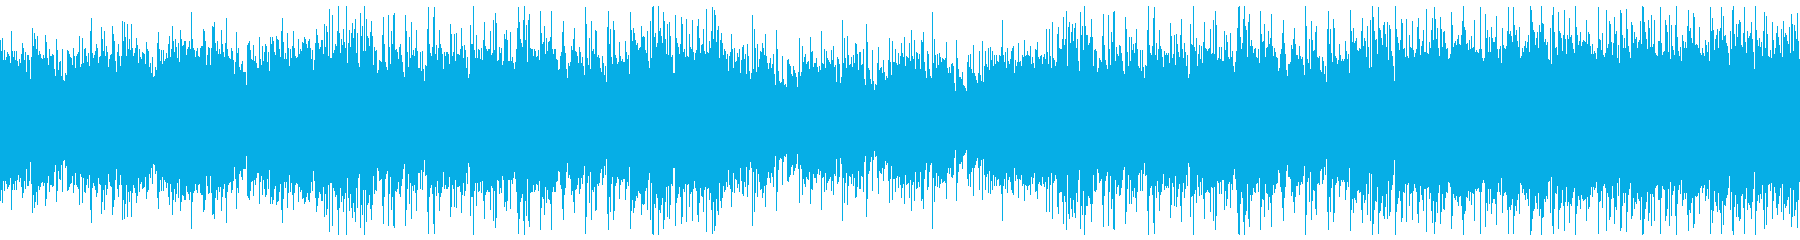 CM・ポジティブなシニア・ポップ・ループの再生済みの波形